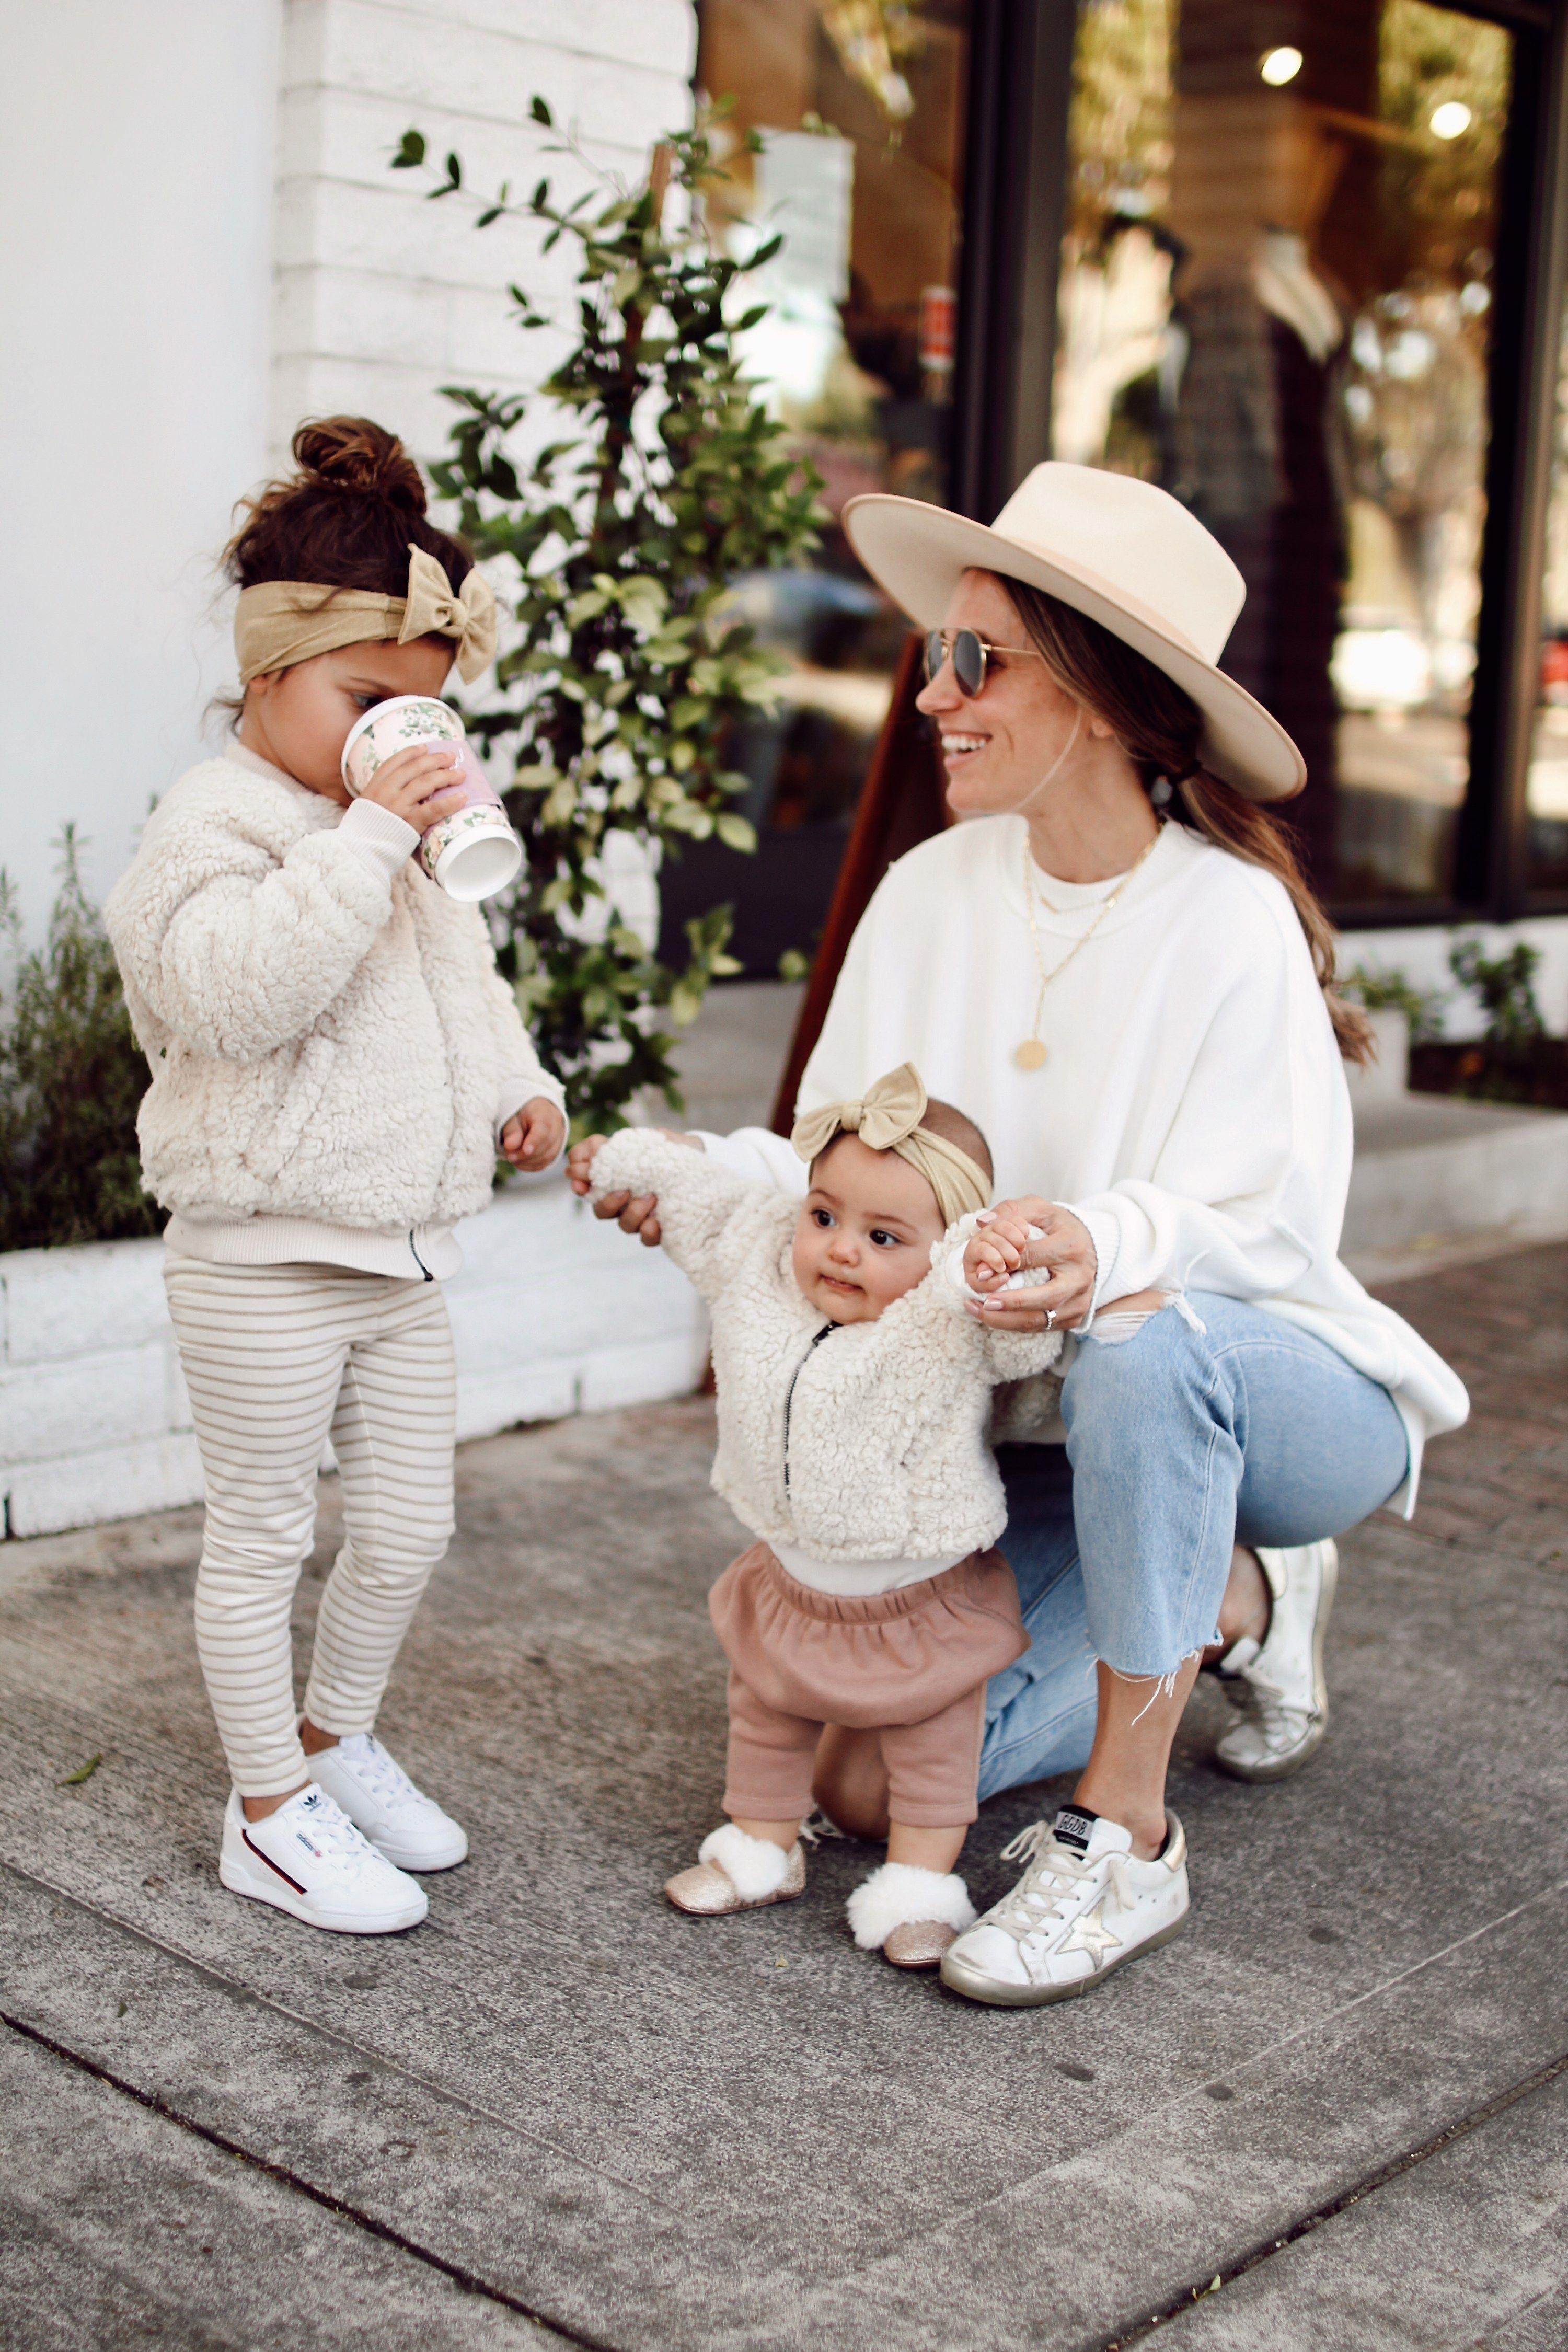 Motherhood || Dressing A Toddler + Two Matching Sherpas #fallootd #falloutfits #babylove #style